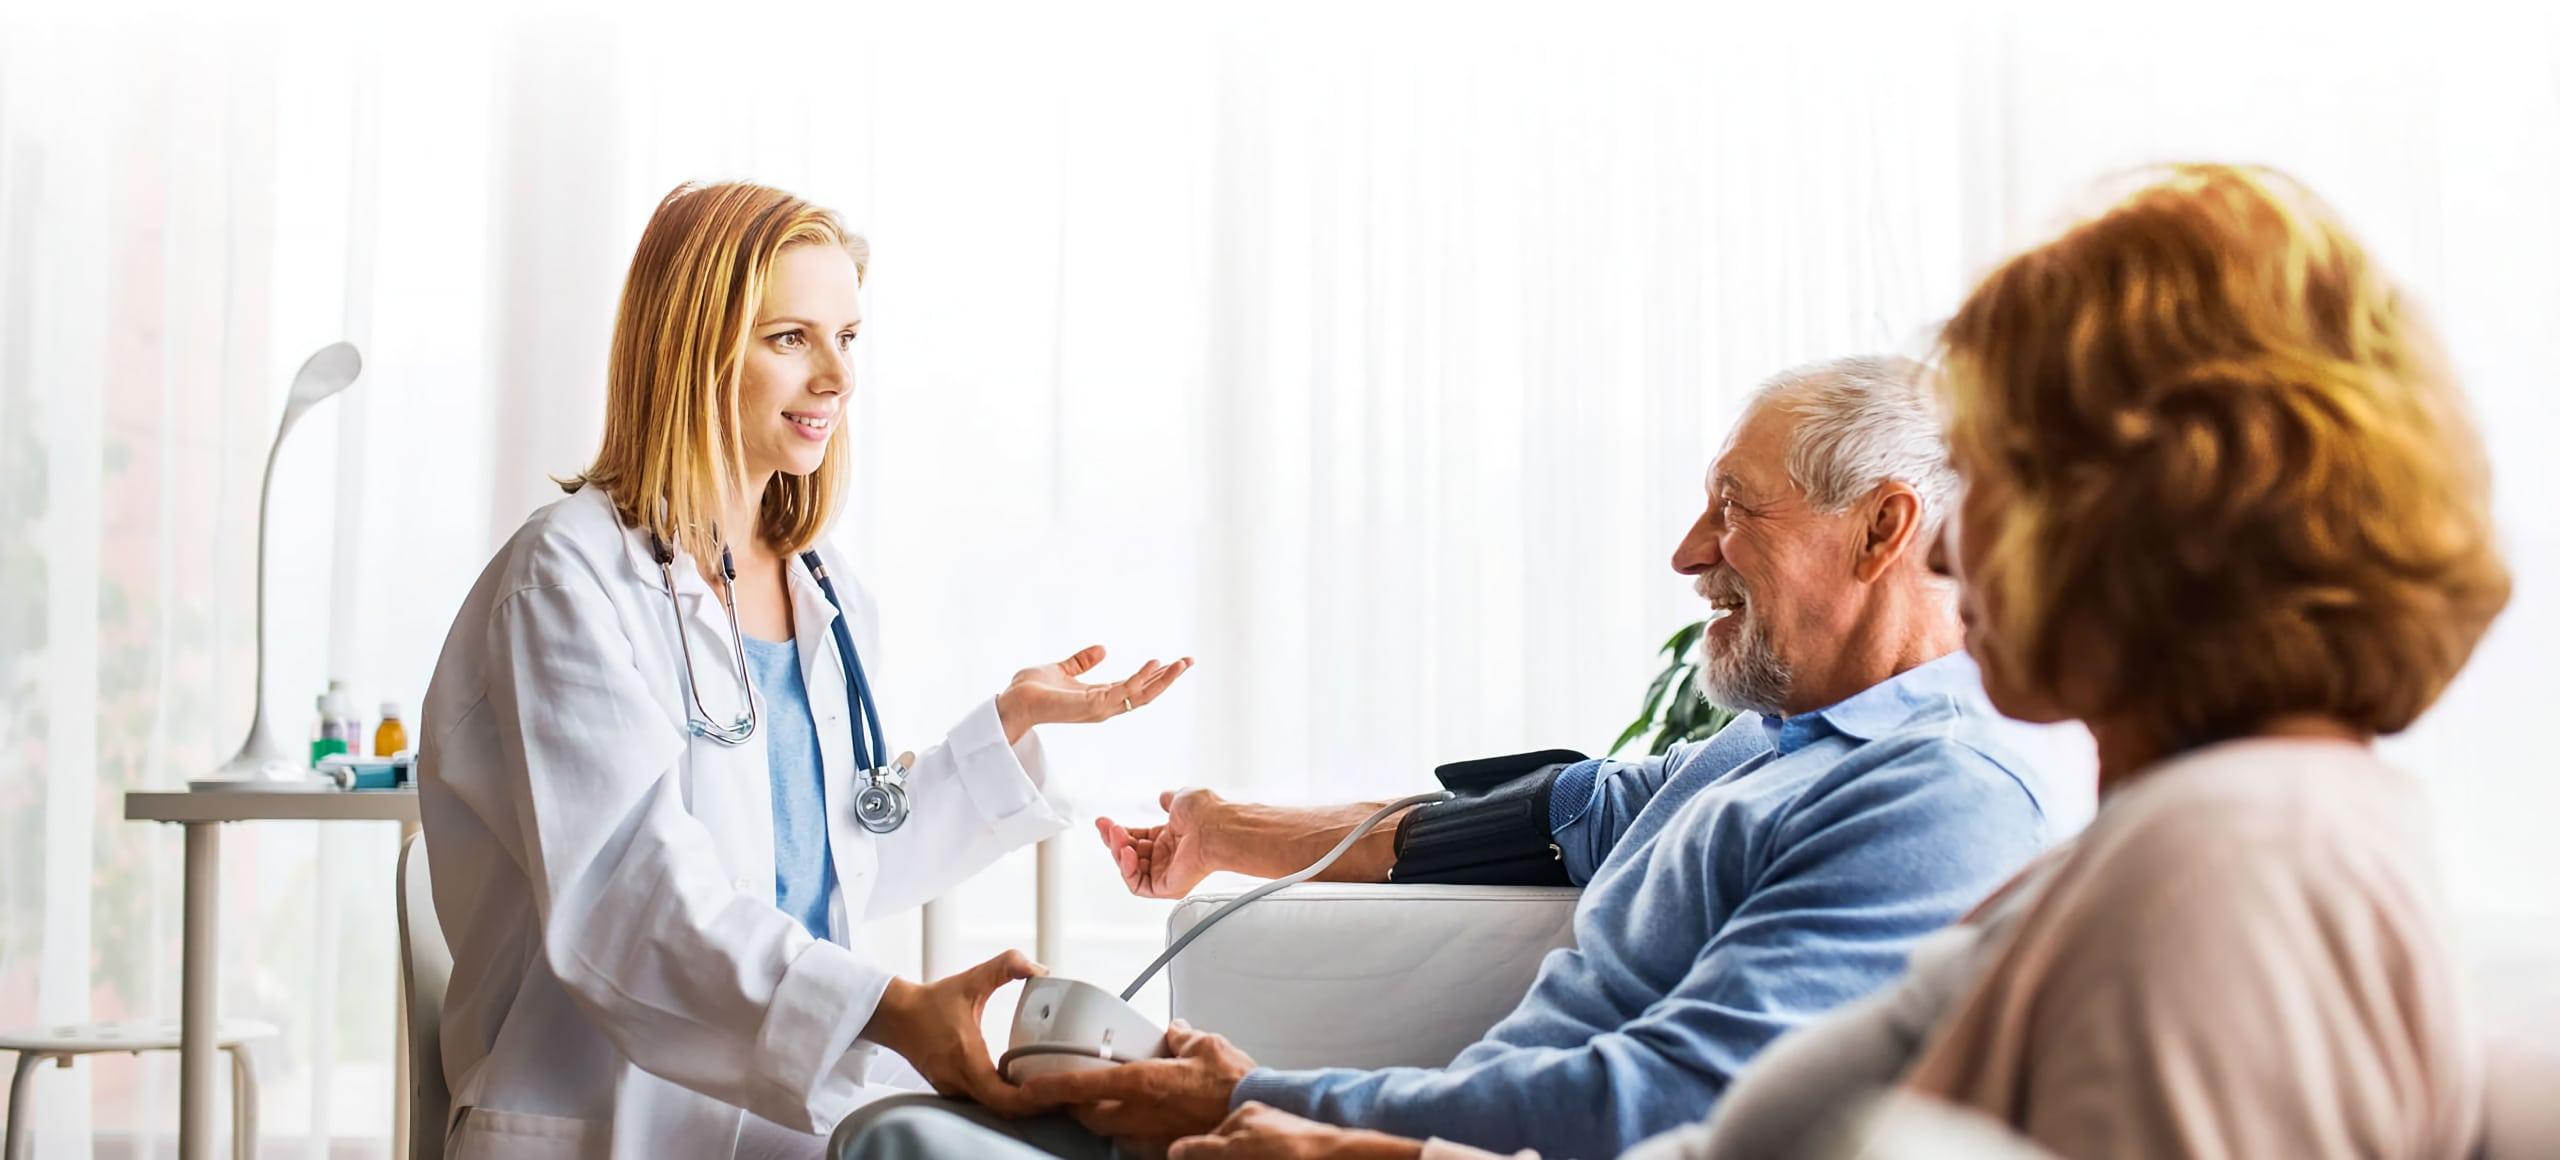 Doctors House Calls